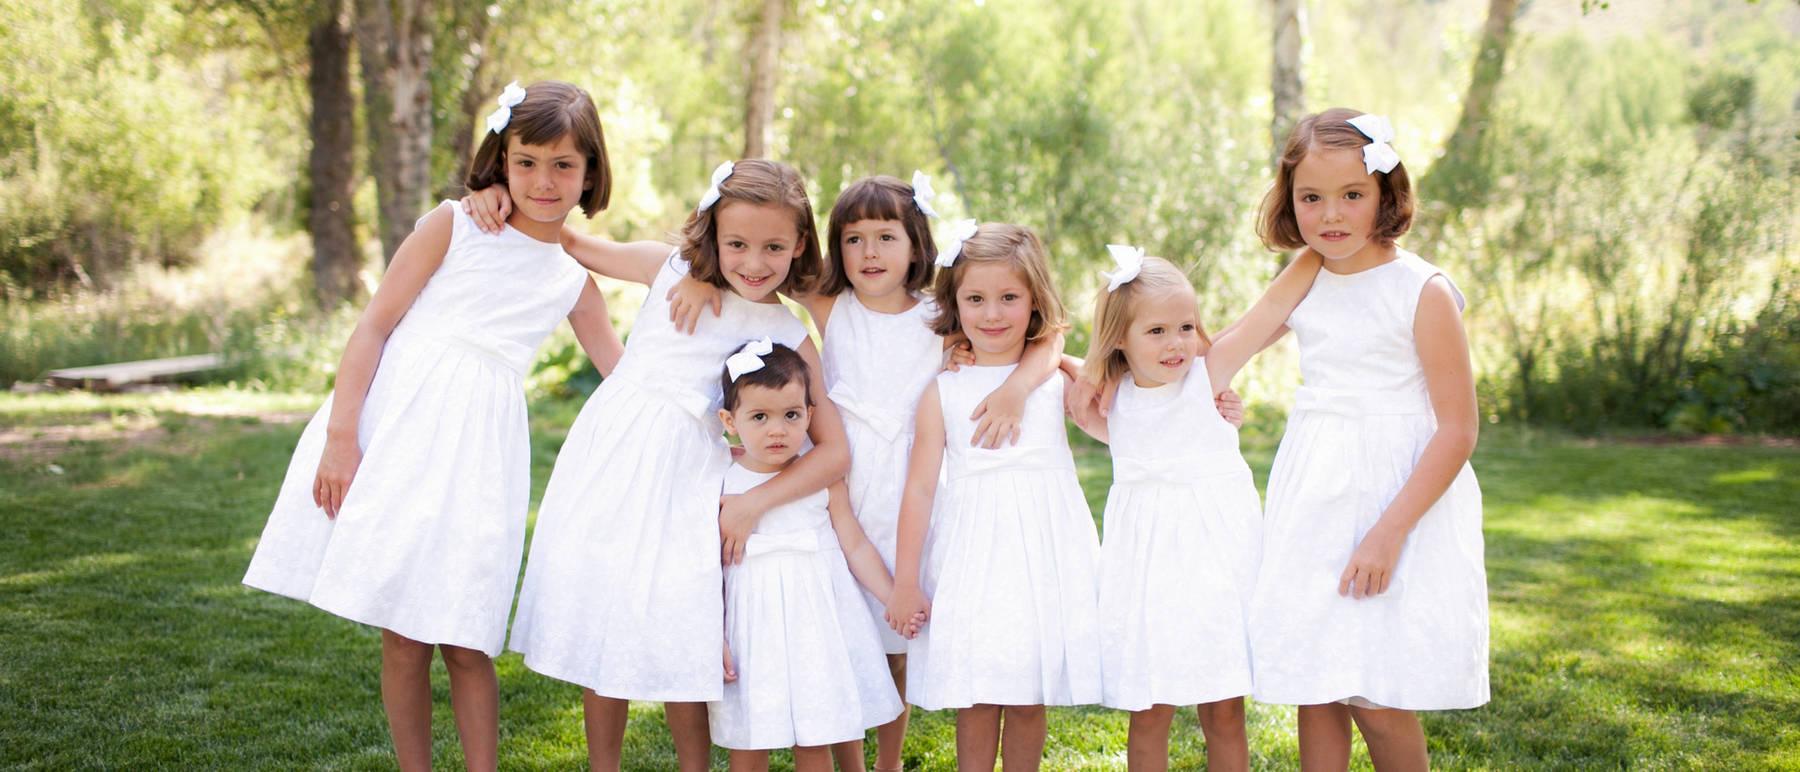 johnandjoseph-wedding-photographer-hz-slider-301